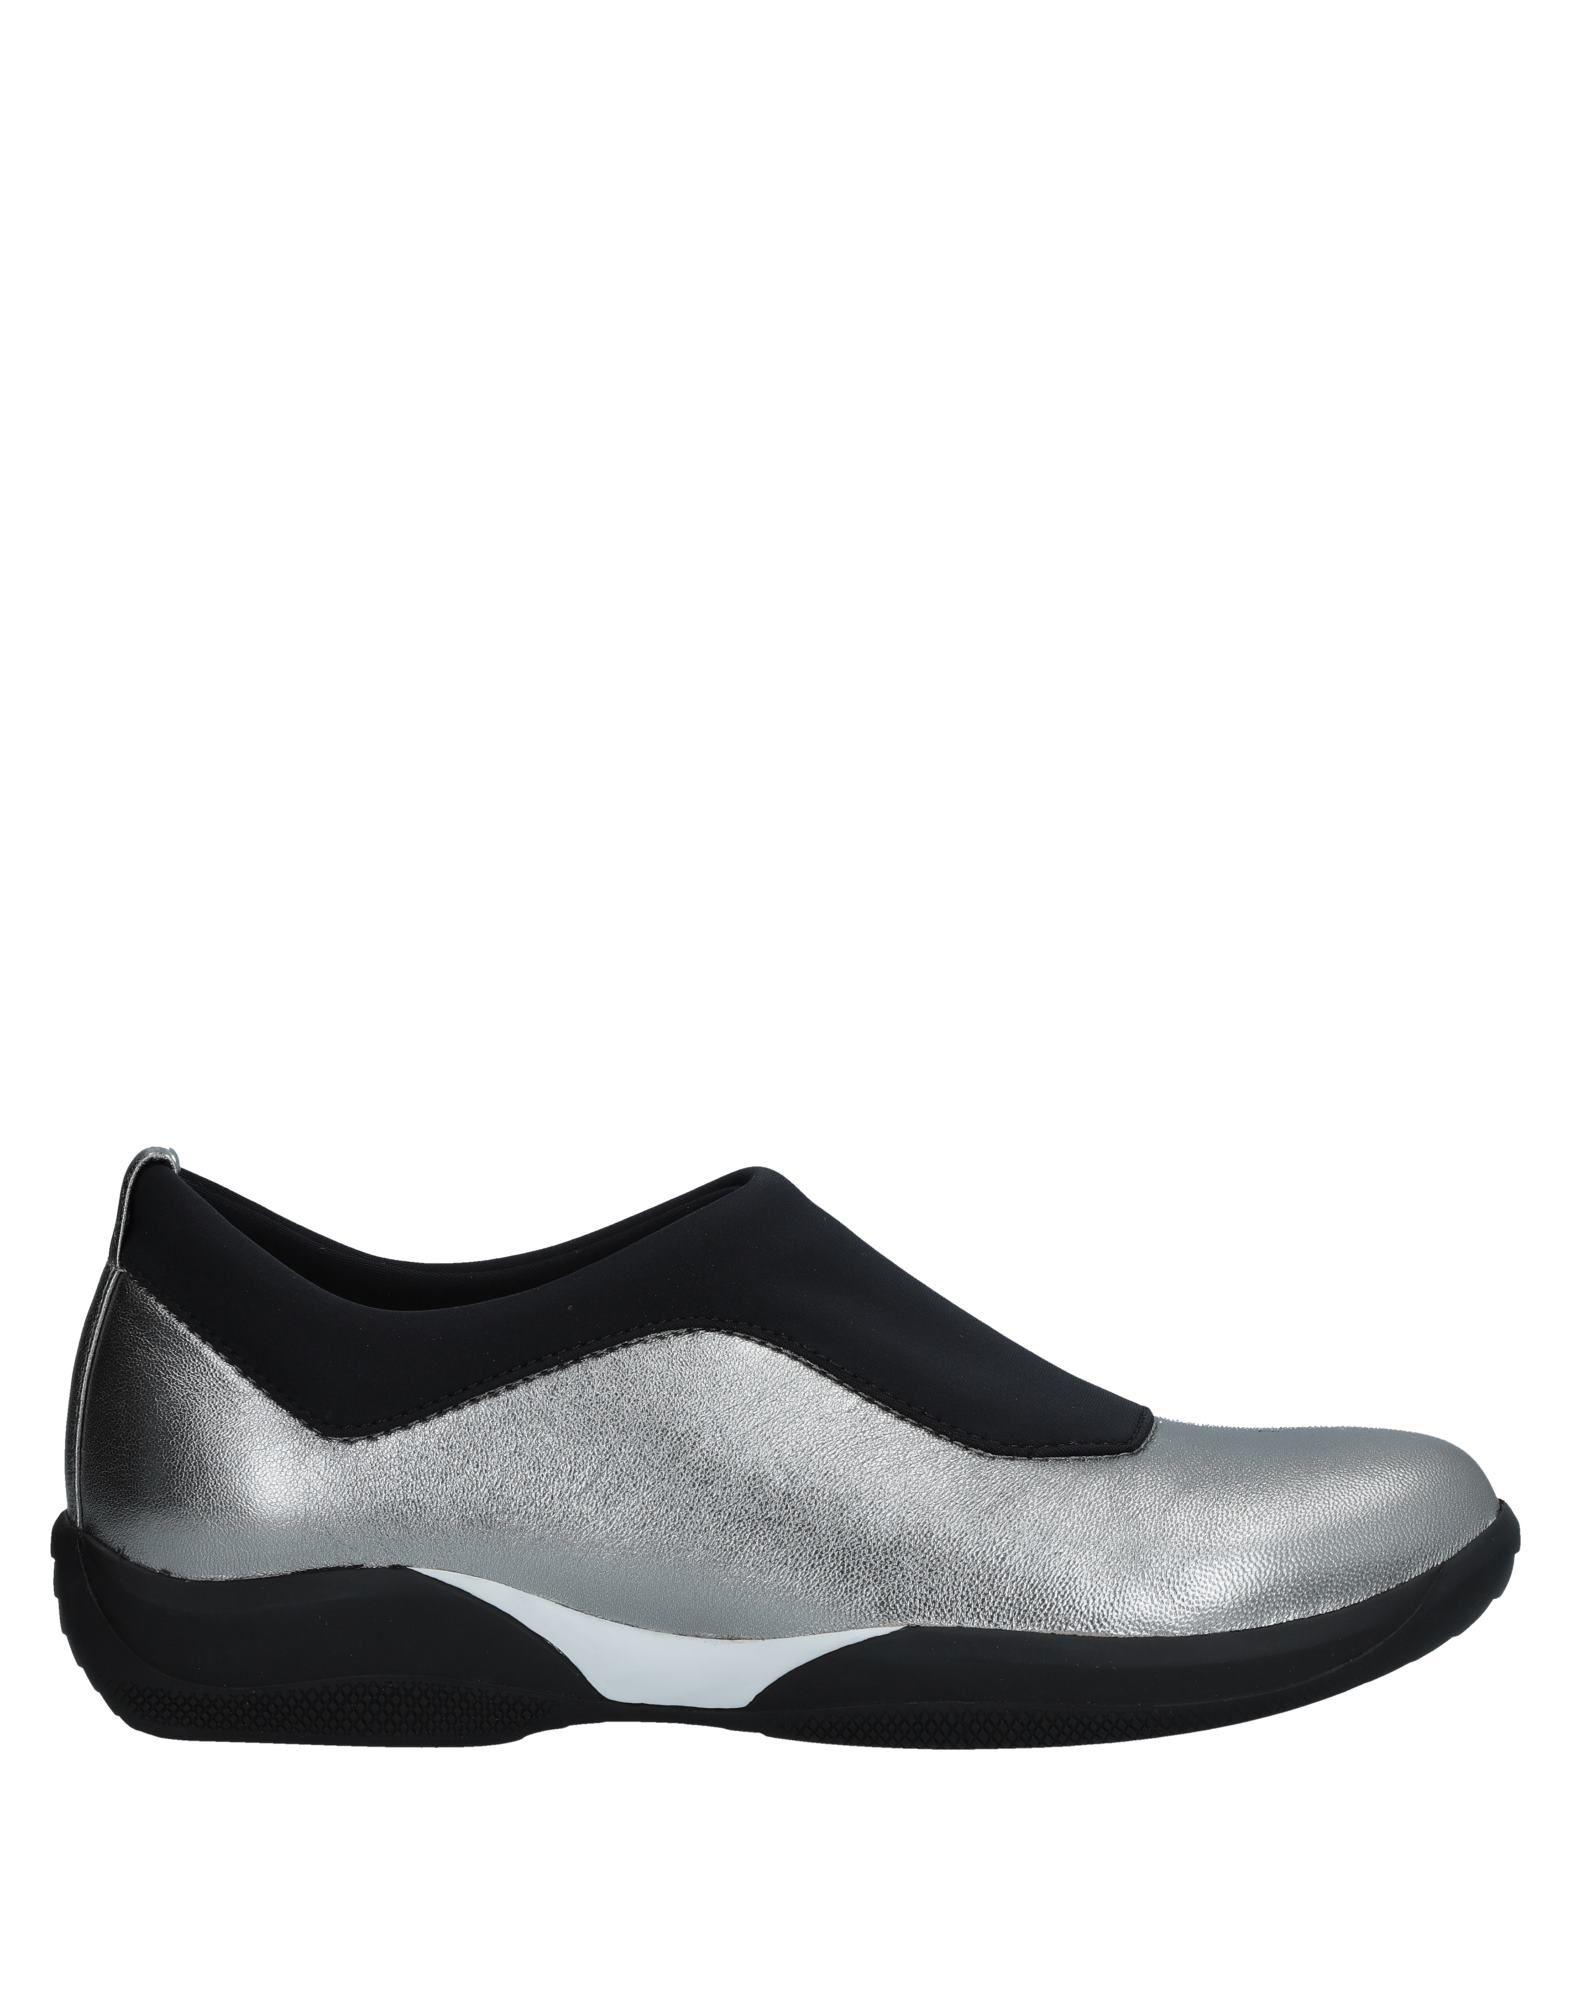 Prada Sport Sport Sneakers - Women Prada Sport Sport Sneakers online on  United Kingdom - 11543502IN 88eae1